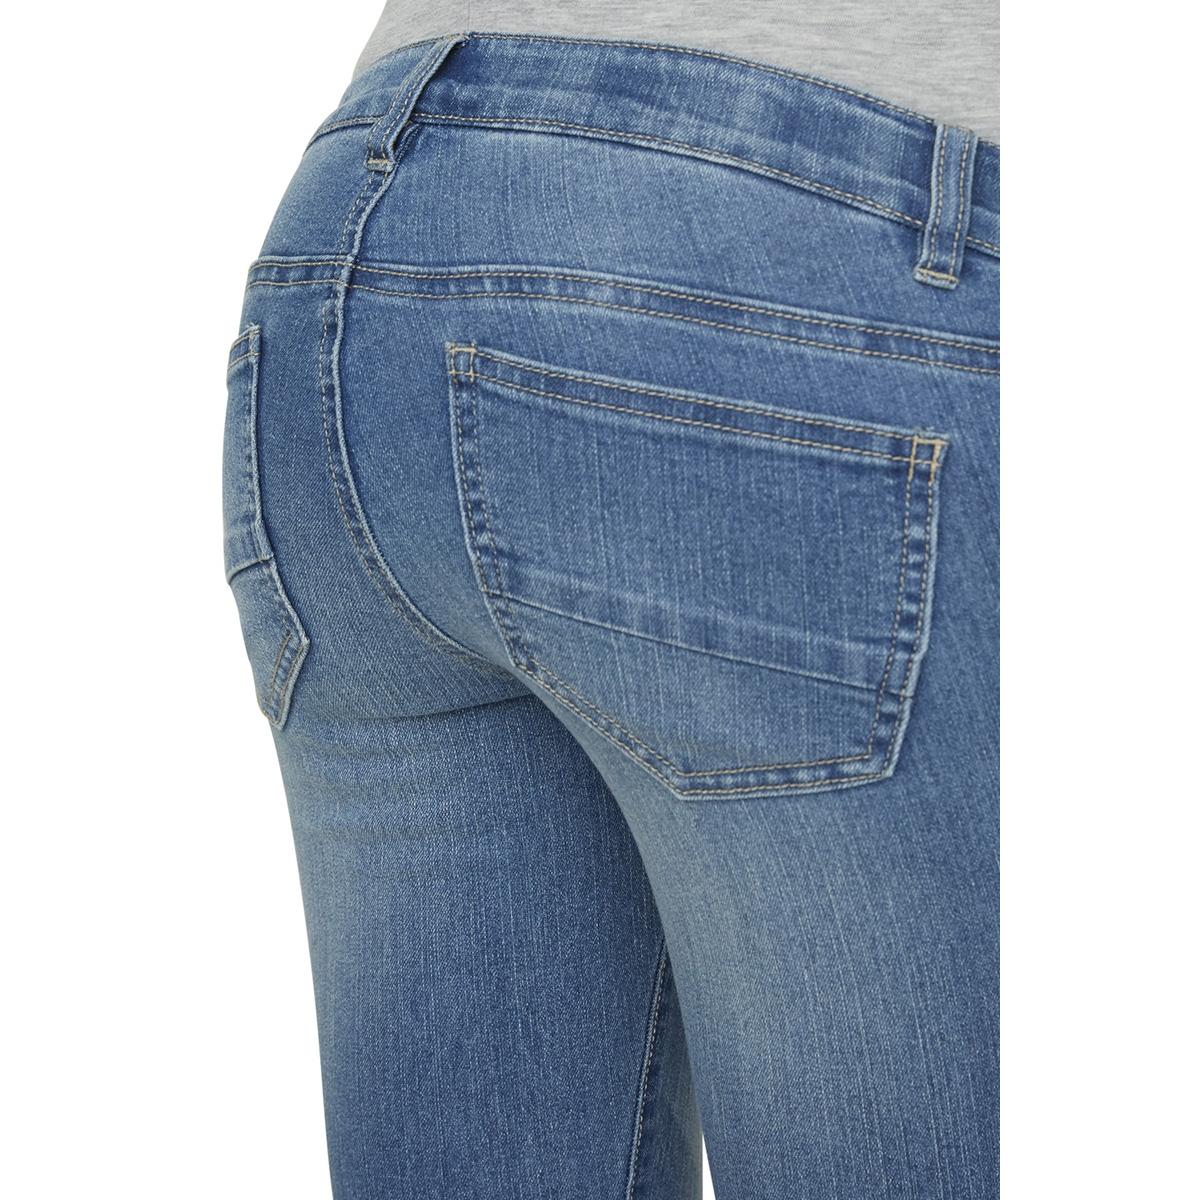 mlriga slim 7/8 zip jeans  20008068 mama-licious positie broek light blue denim